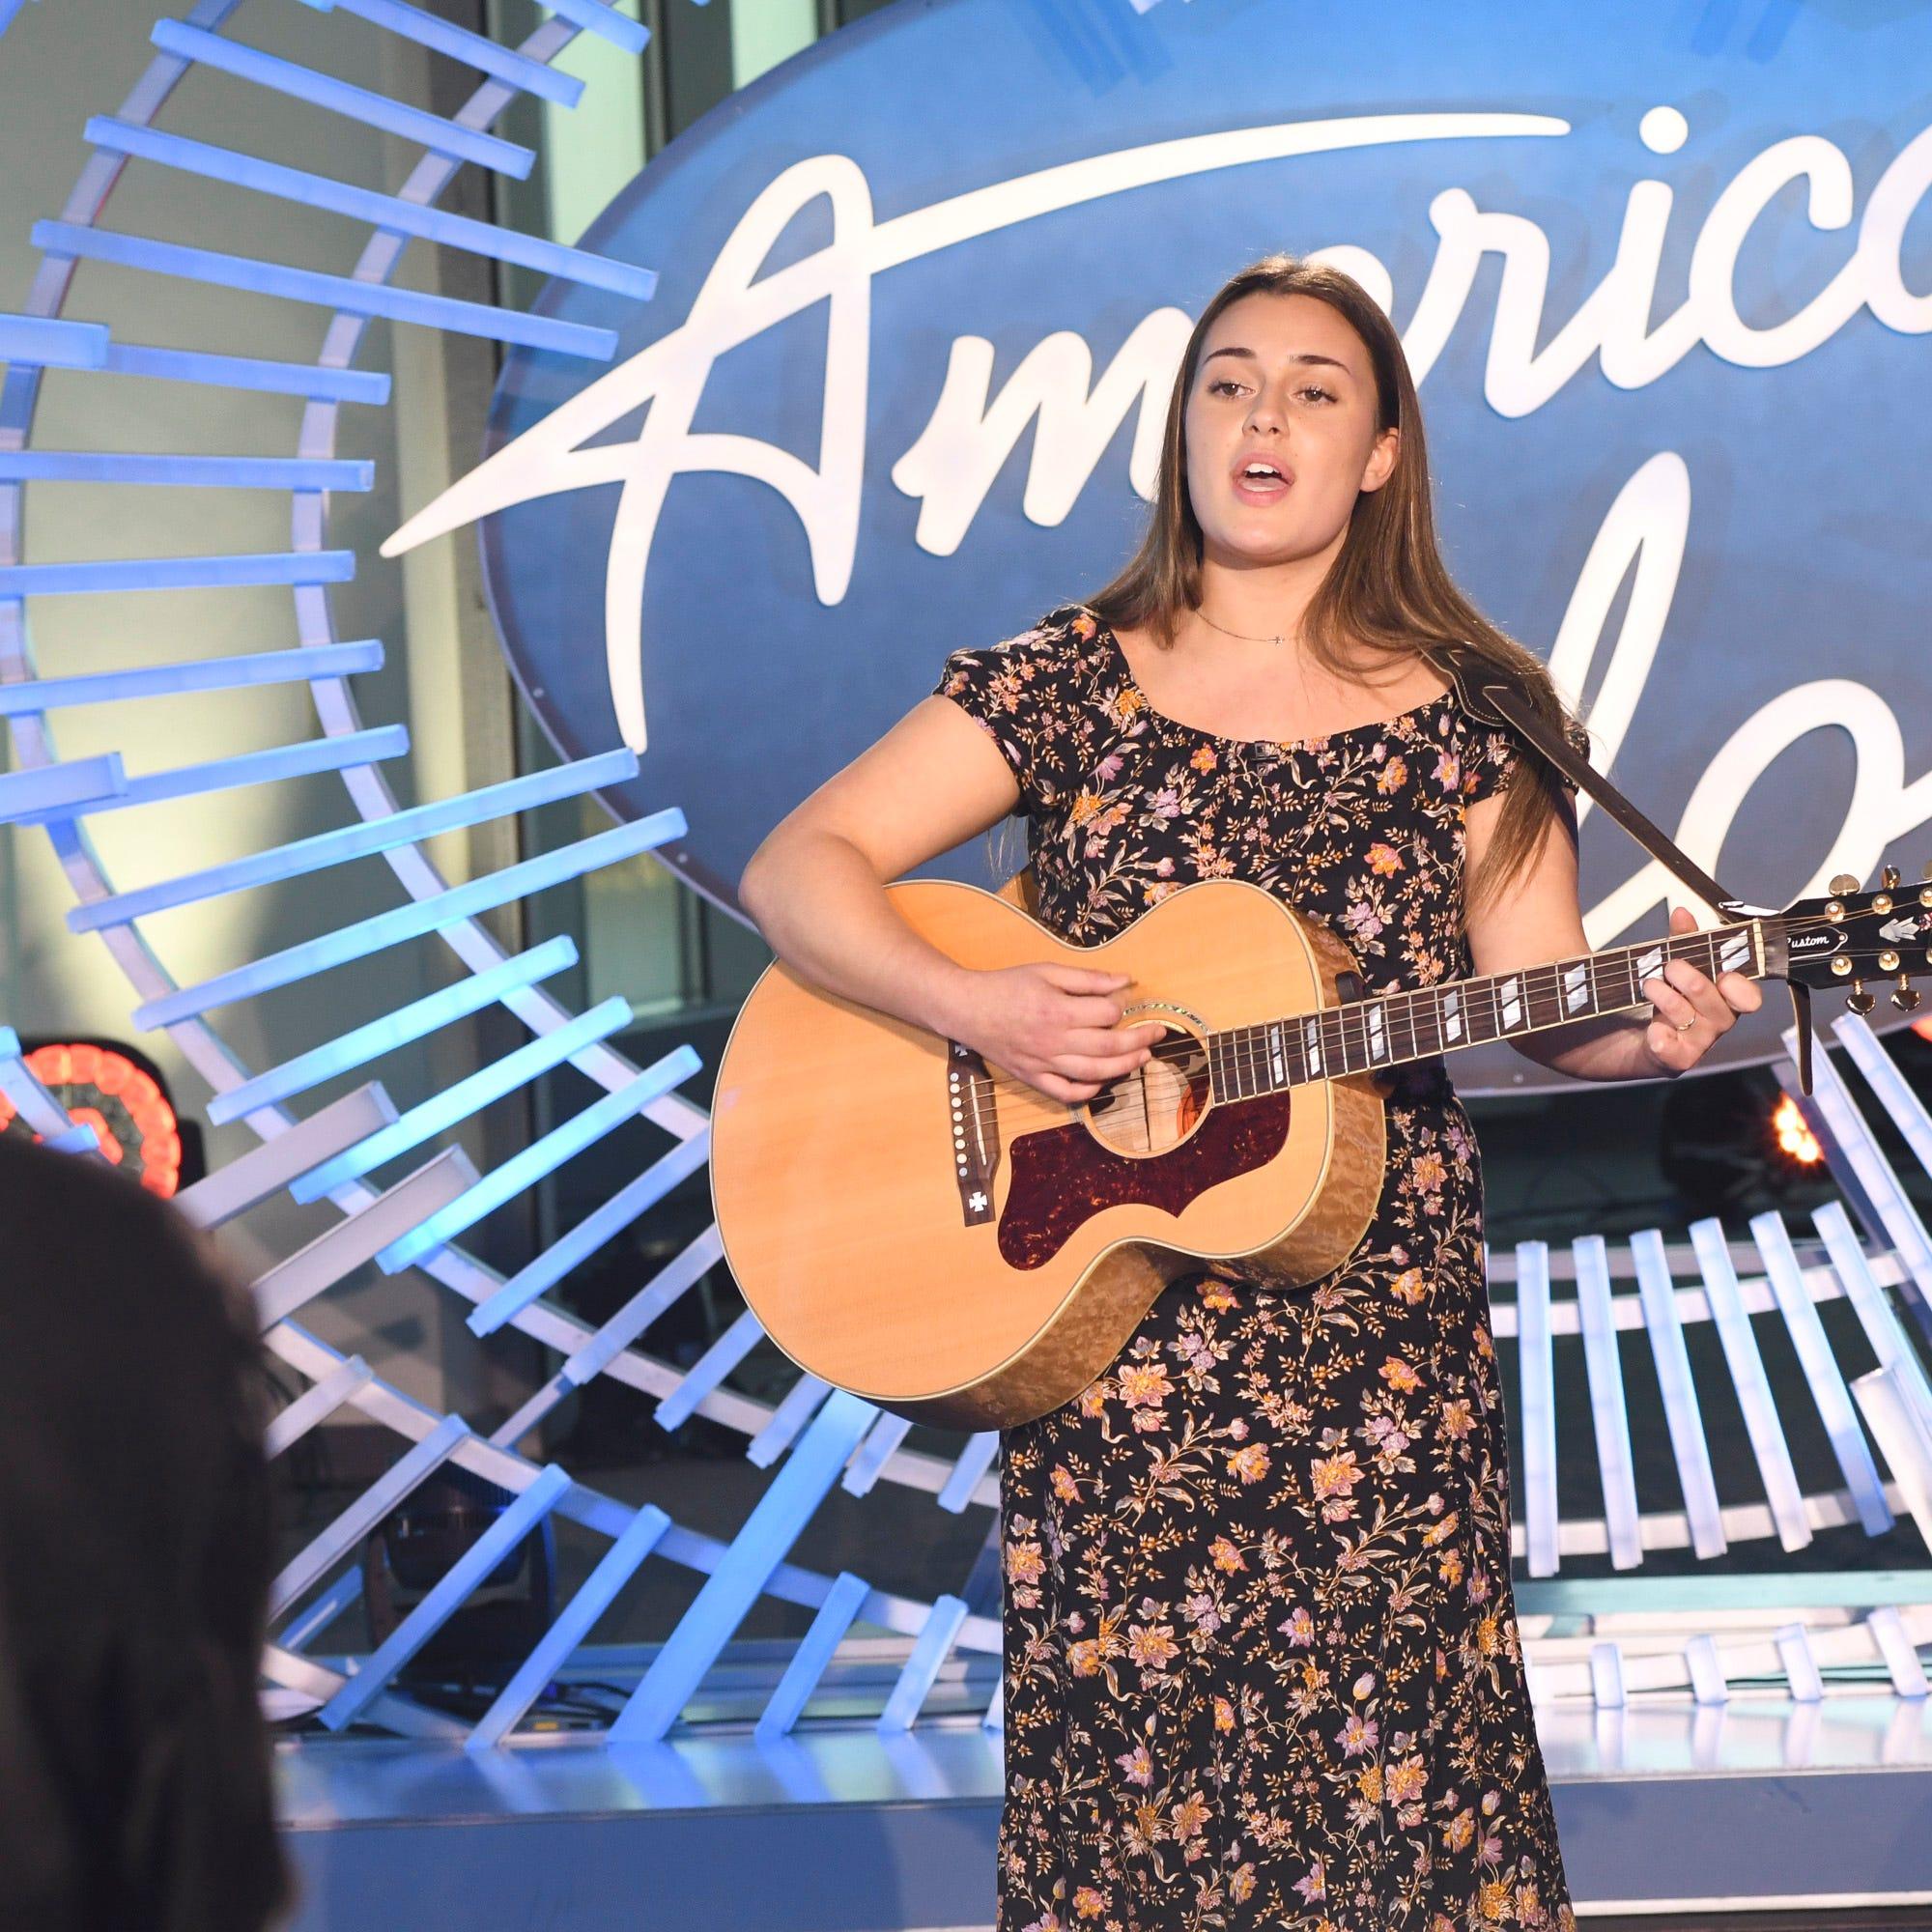 American Idol: Sydney Sherwood of Marlboro's going to Hollywood